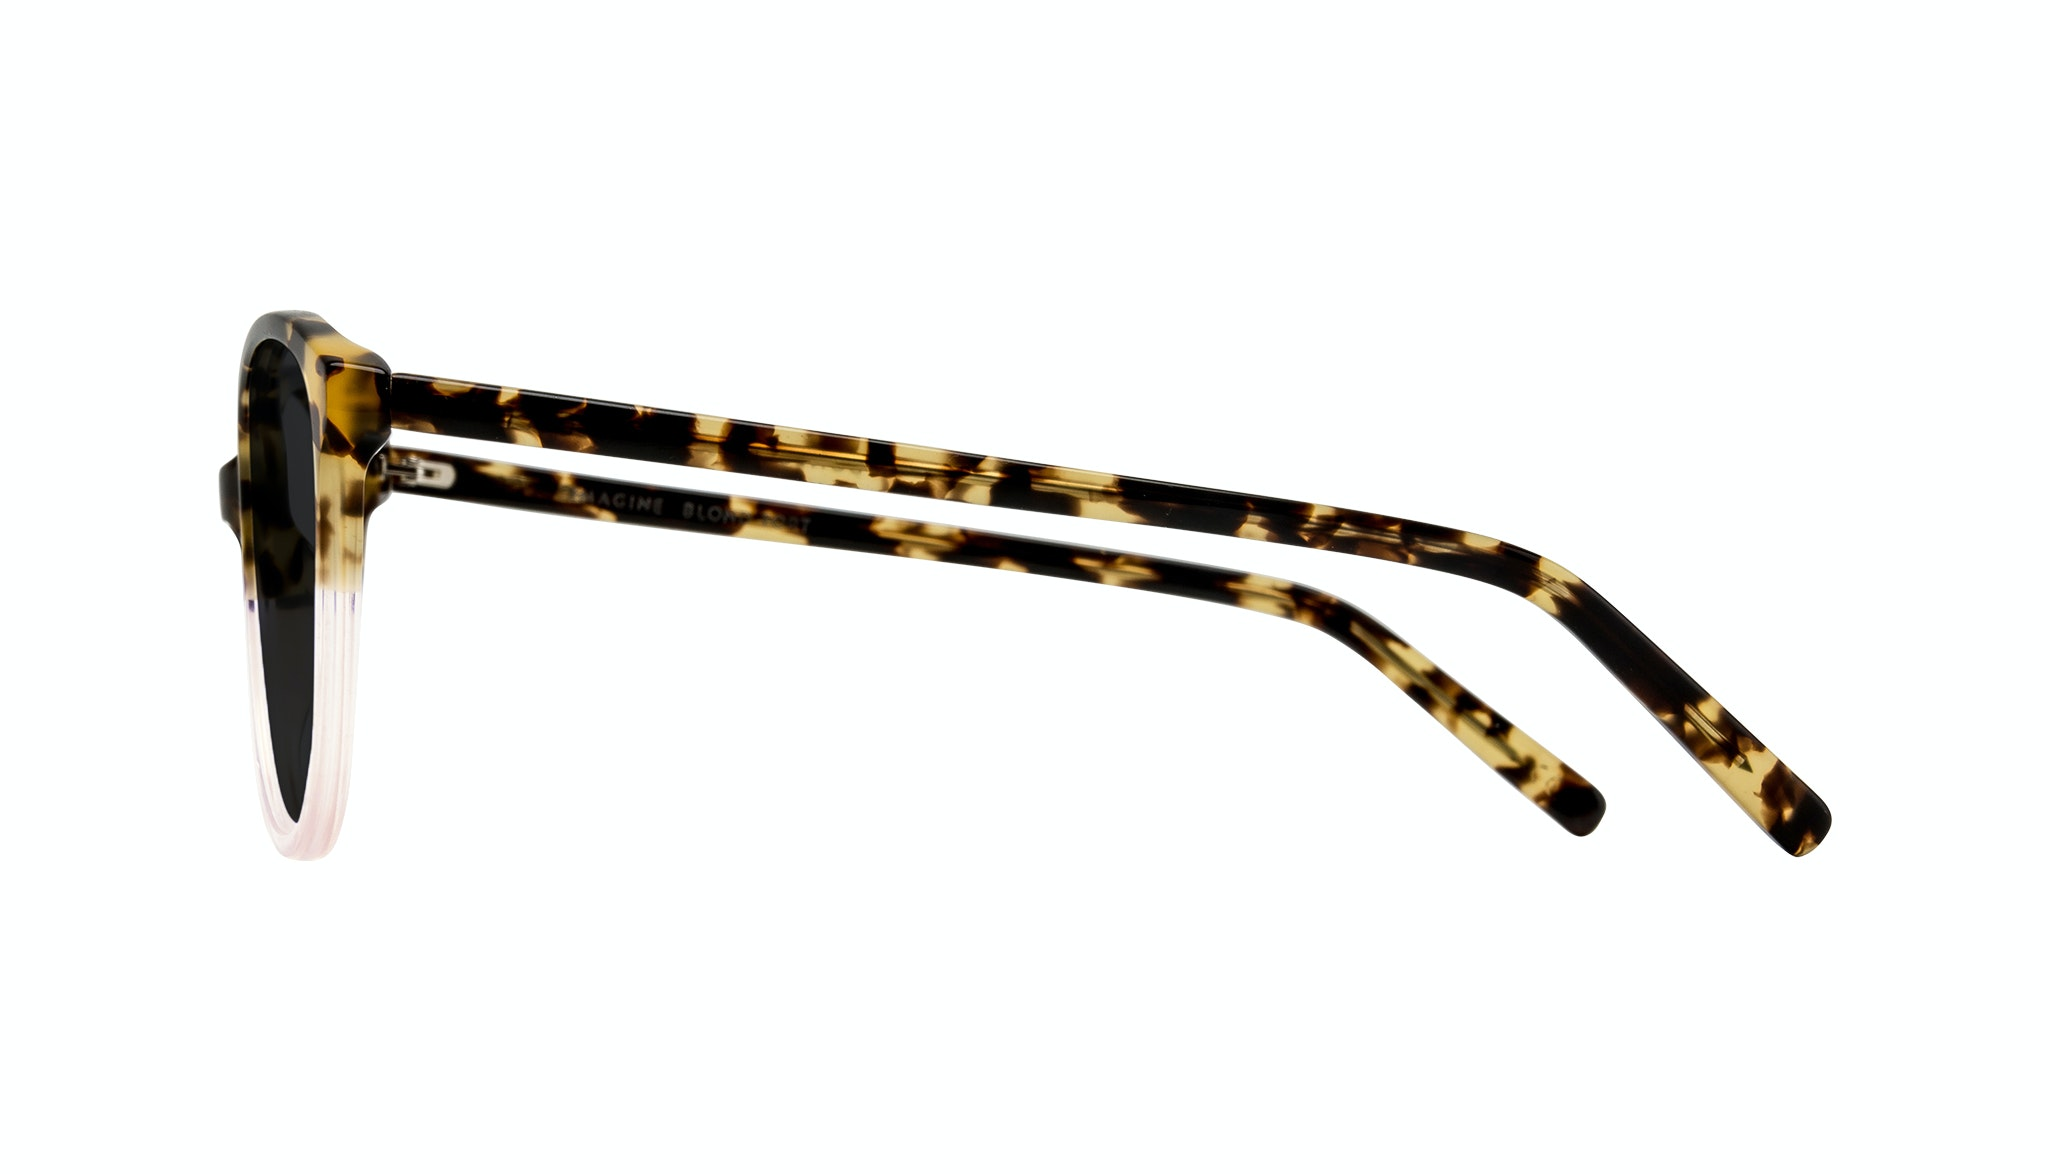 Affordable Fashion Glasses Cat Eye Round Sunglasses Women Imagine Blond Tort Side